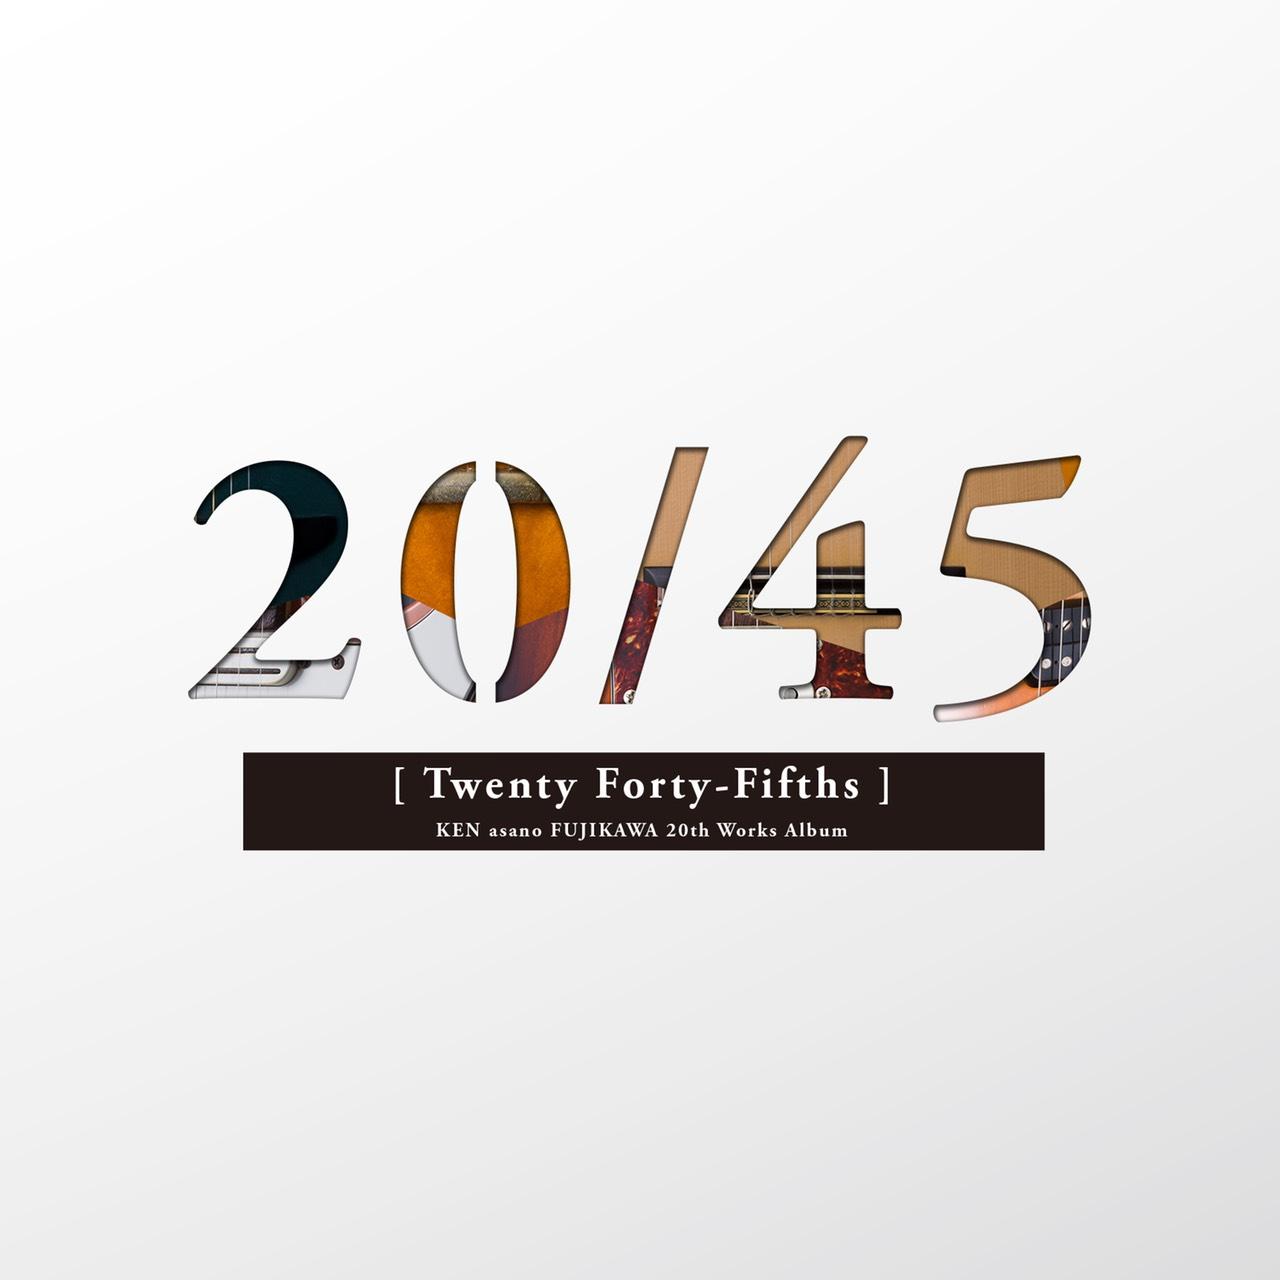 KEN asano FUJIKAWA / 20th Works Album 『20/45』